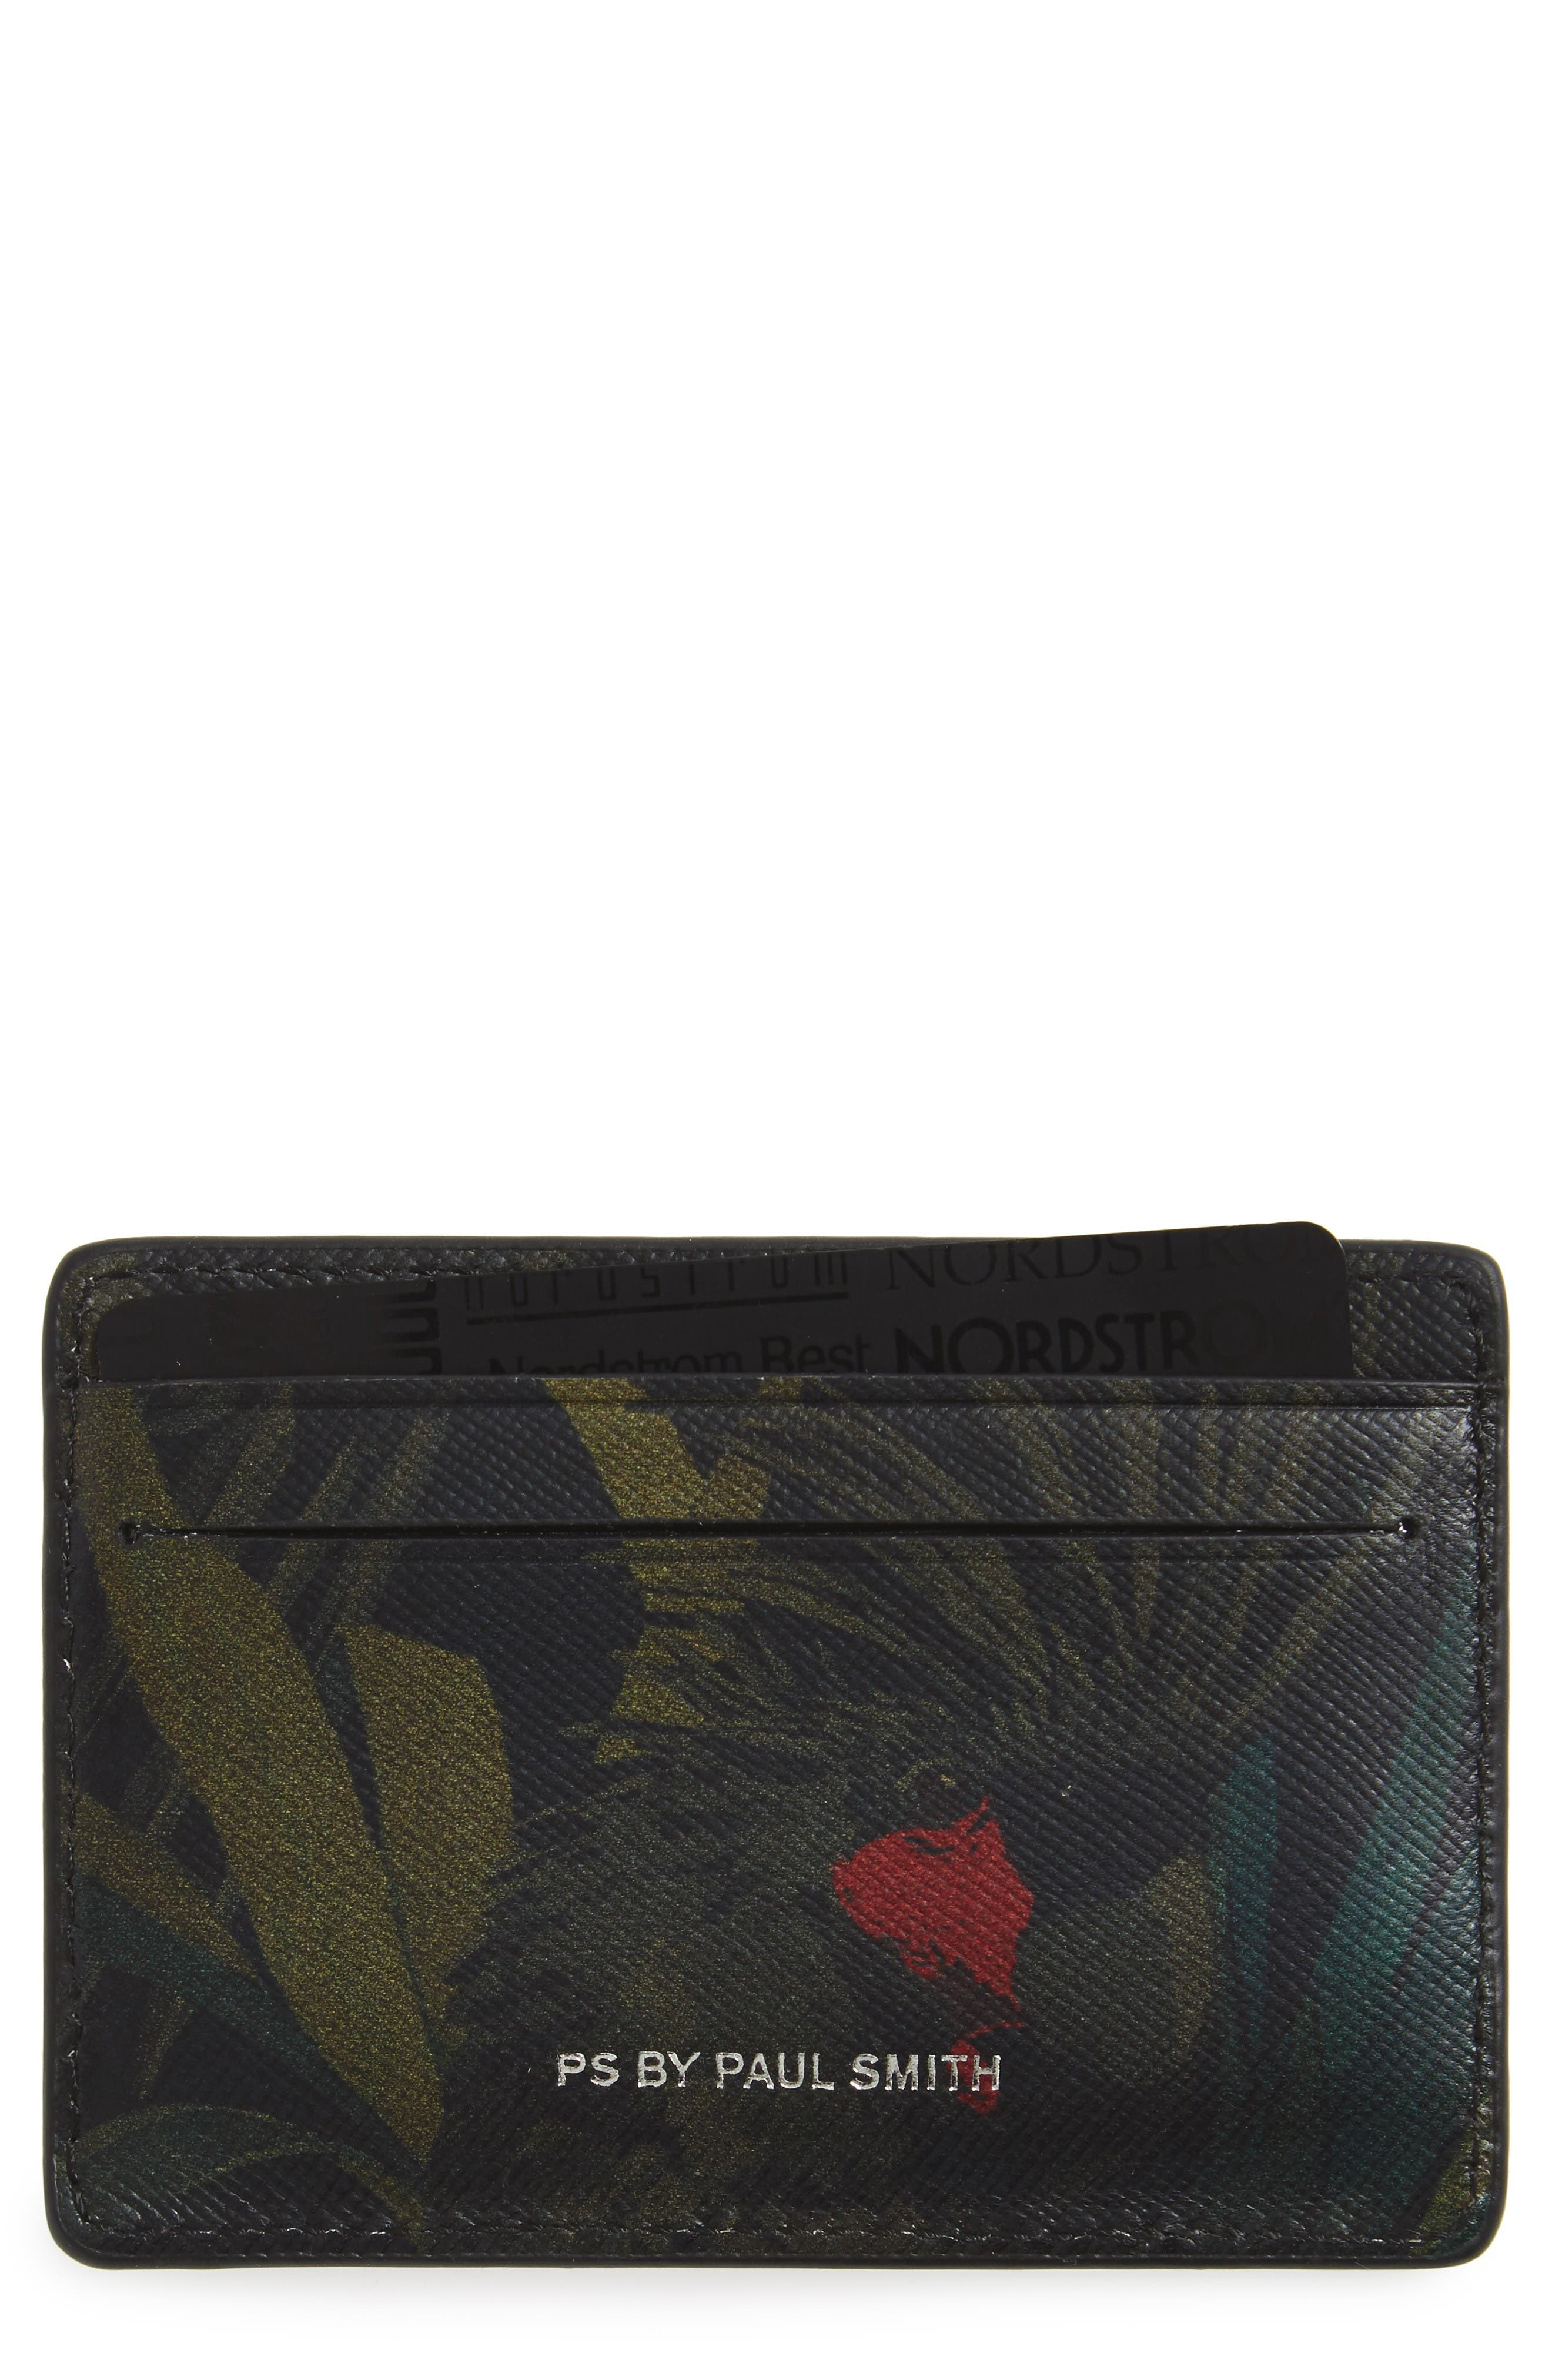 Paul Smith Cockatoo Calfskin Leather Card Case